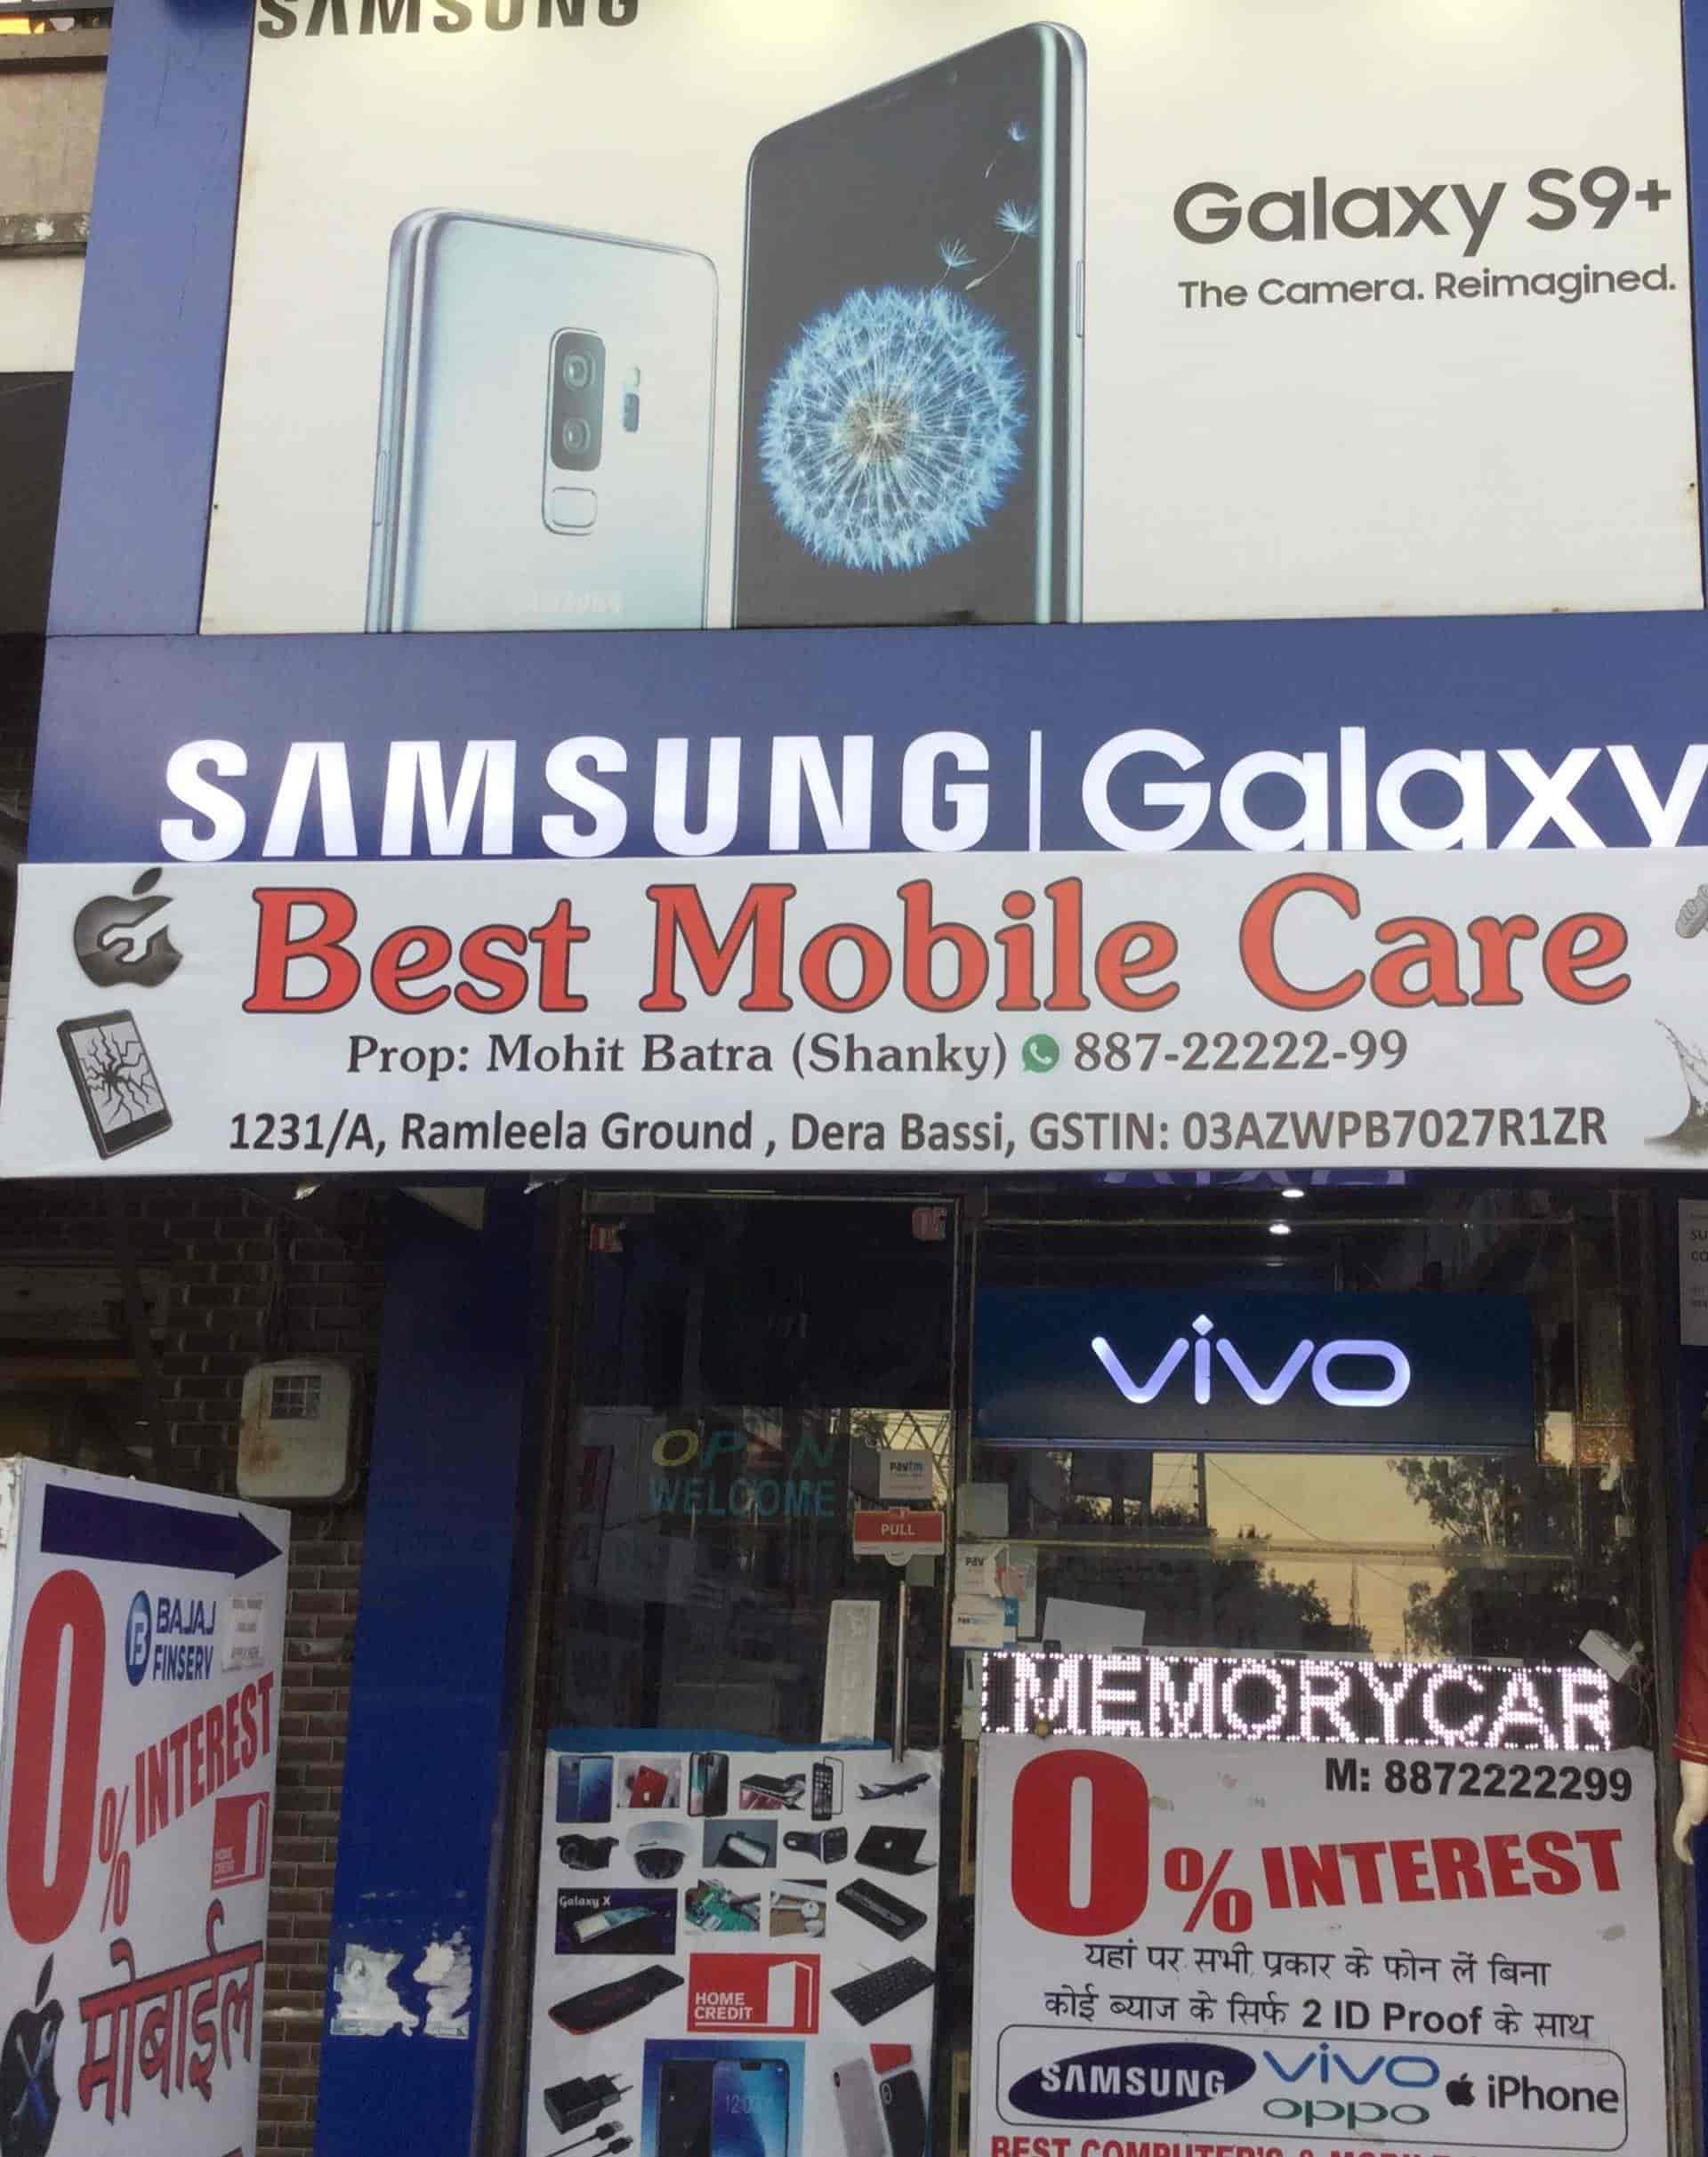 Best Mobile Care Photos, Derabassi, Chandigarh- Pictures